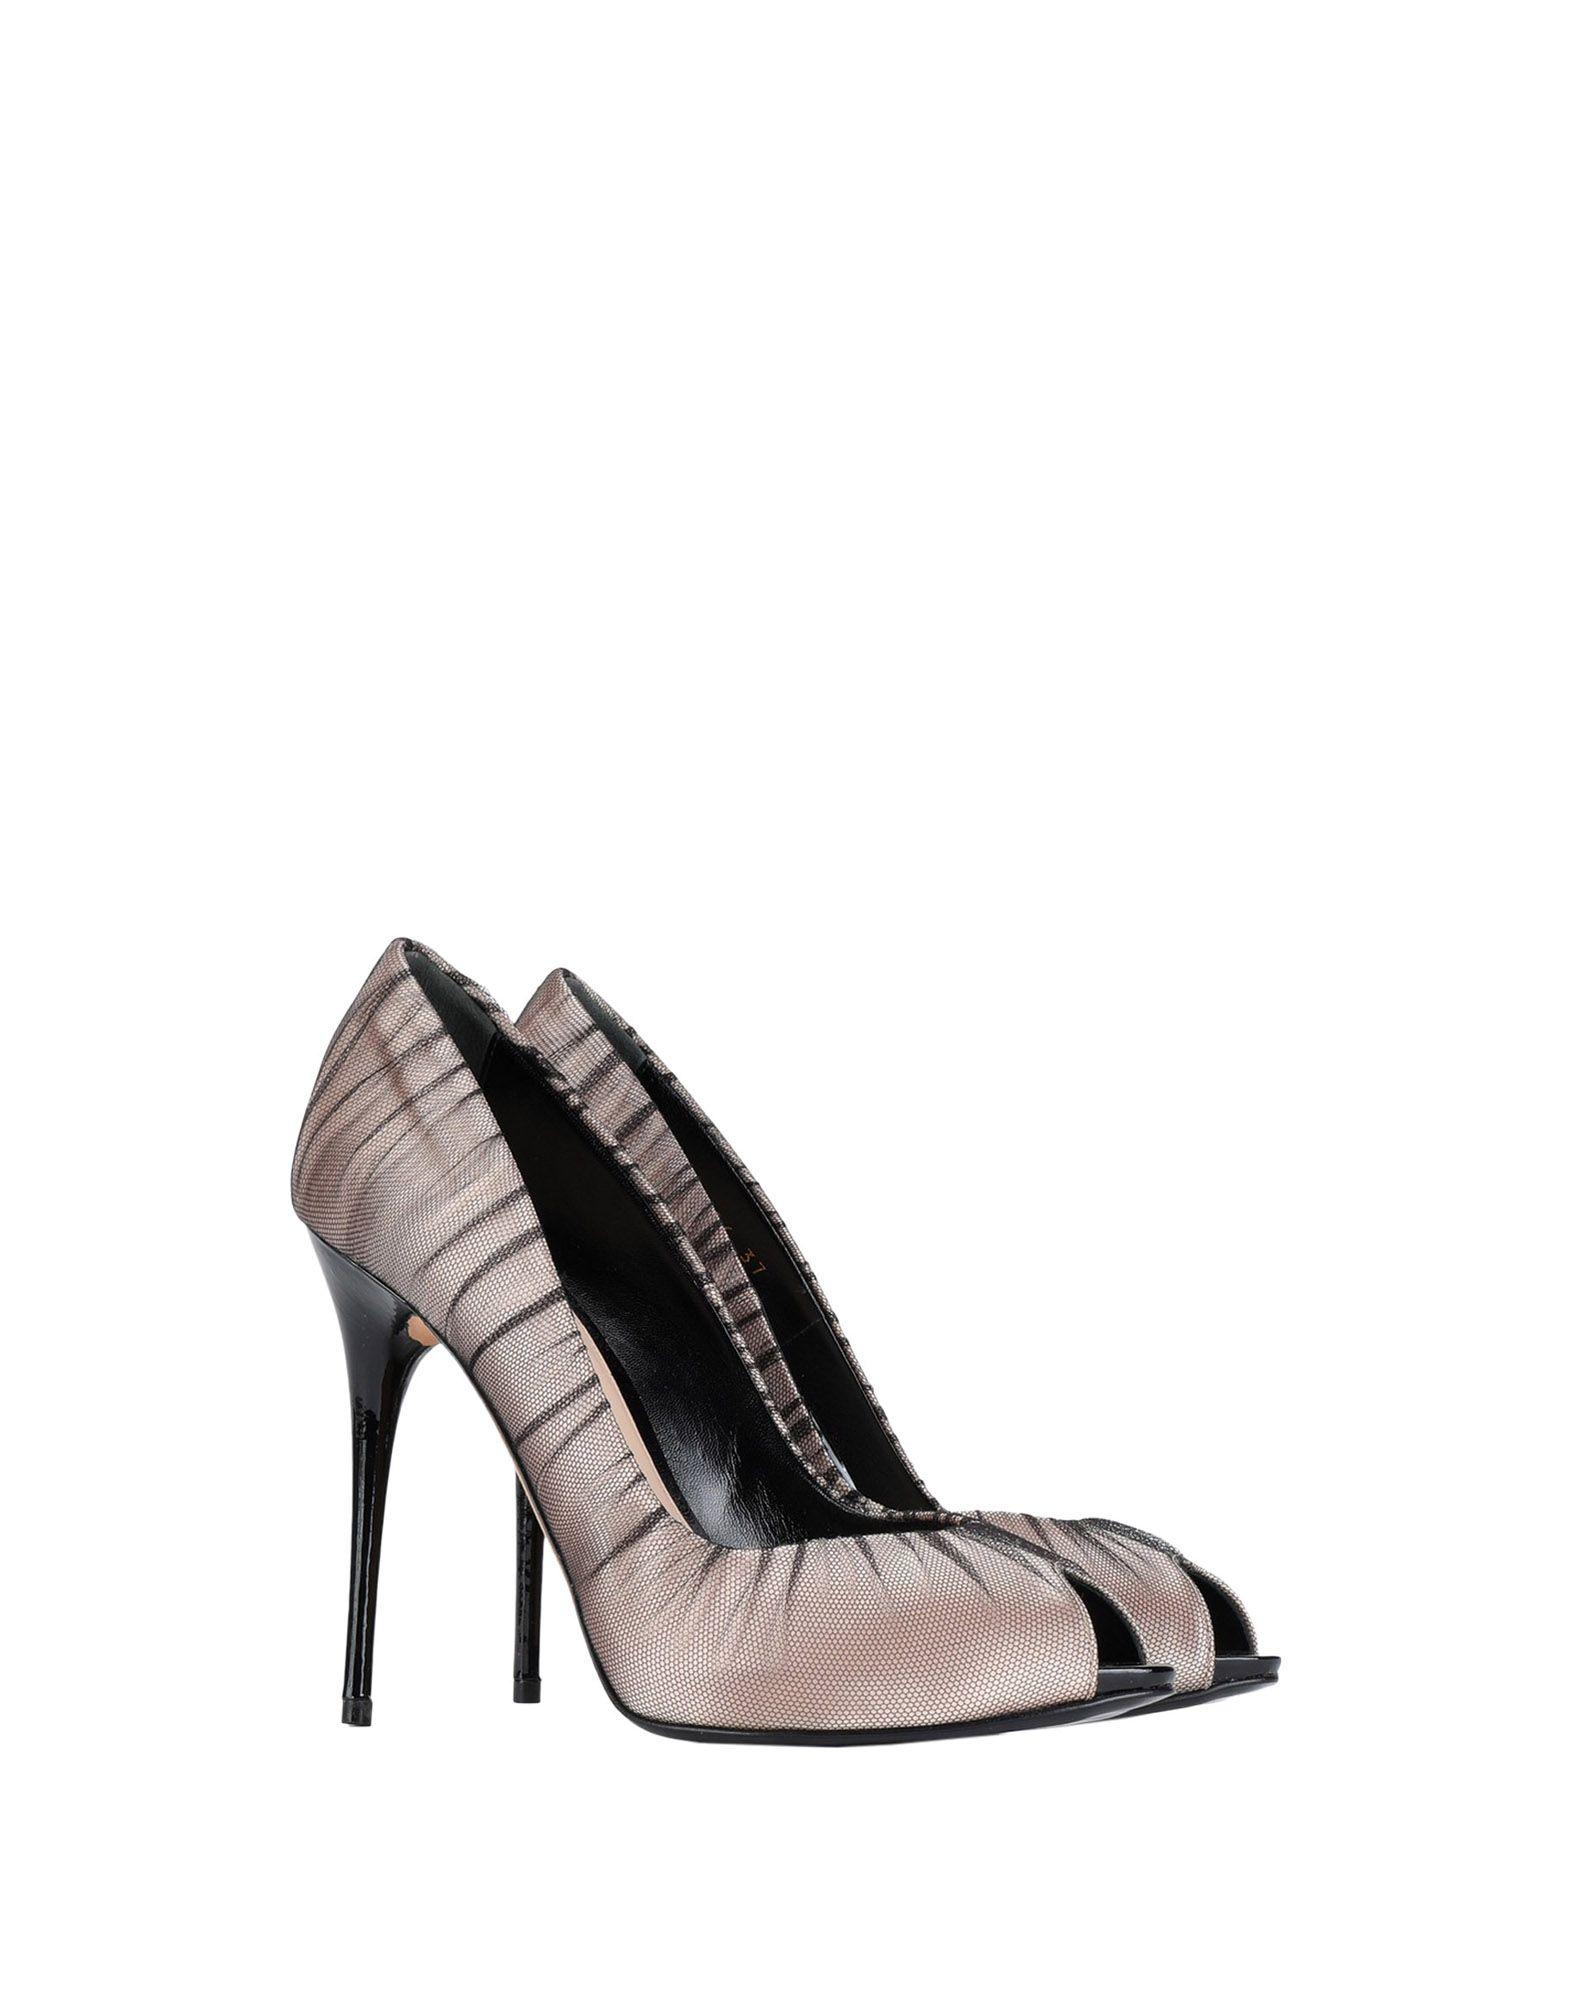 Alexander Mcqueen Pumps Damen aussehende  11528837KIGünstige gut aussehende Damen Schuhe a6931b